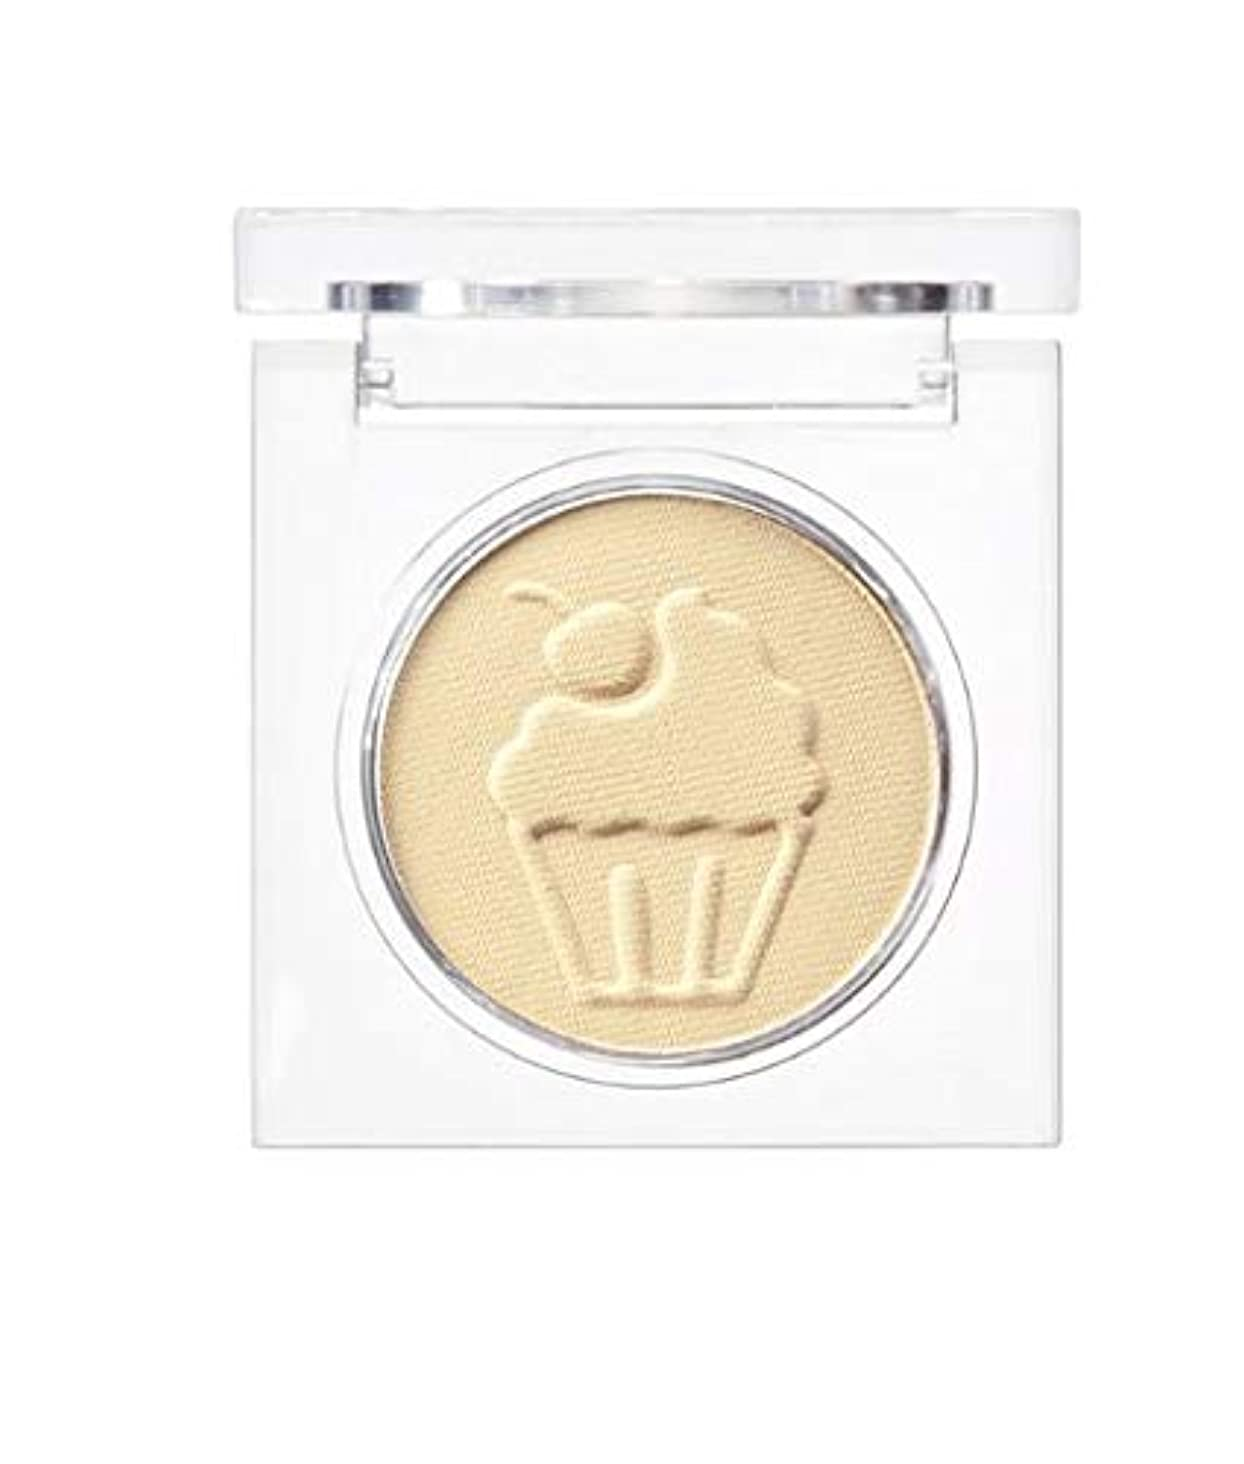 Skinfood マイデザートパーティーアイシャドウ#M01レモンマカロン / My Dessert Party Eyeshadow #M01 Lemon Macaroons [並行輸入品]